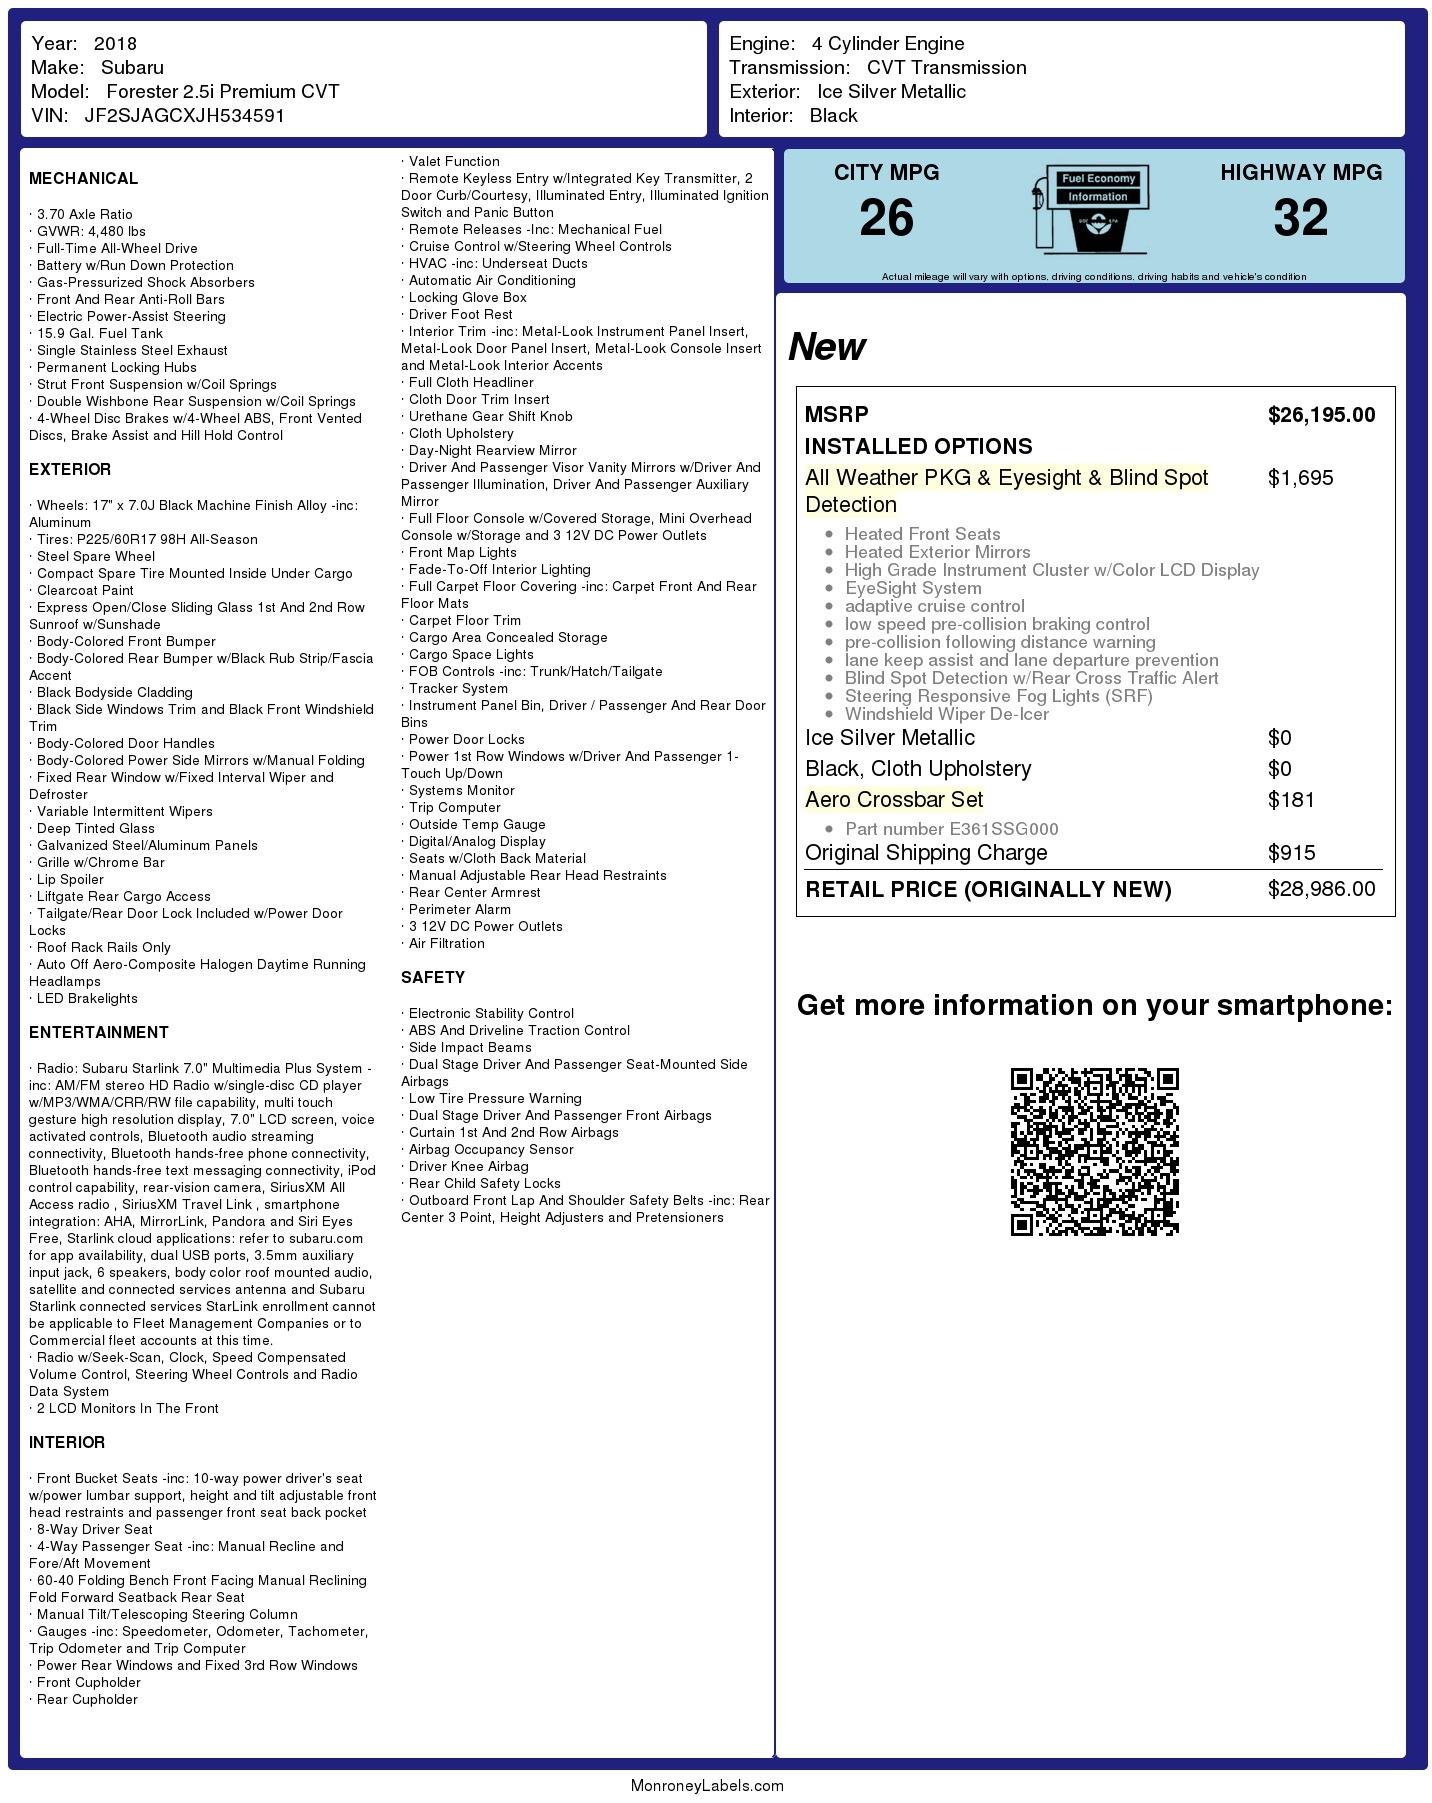 Used 2018 Subaru Forester 25i Premium Sport Utility 4D